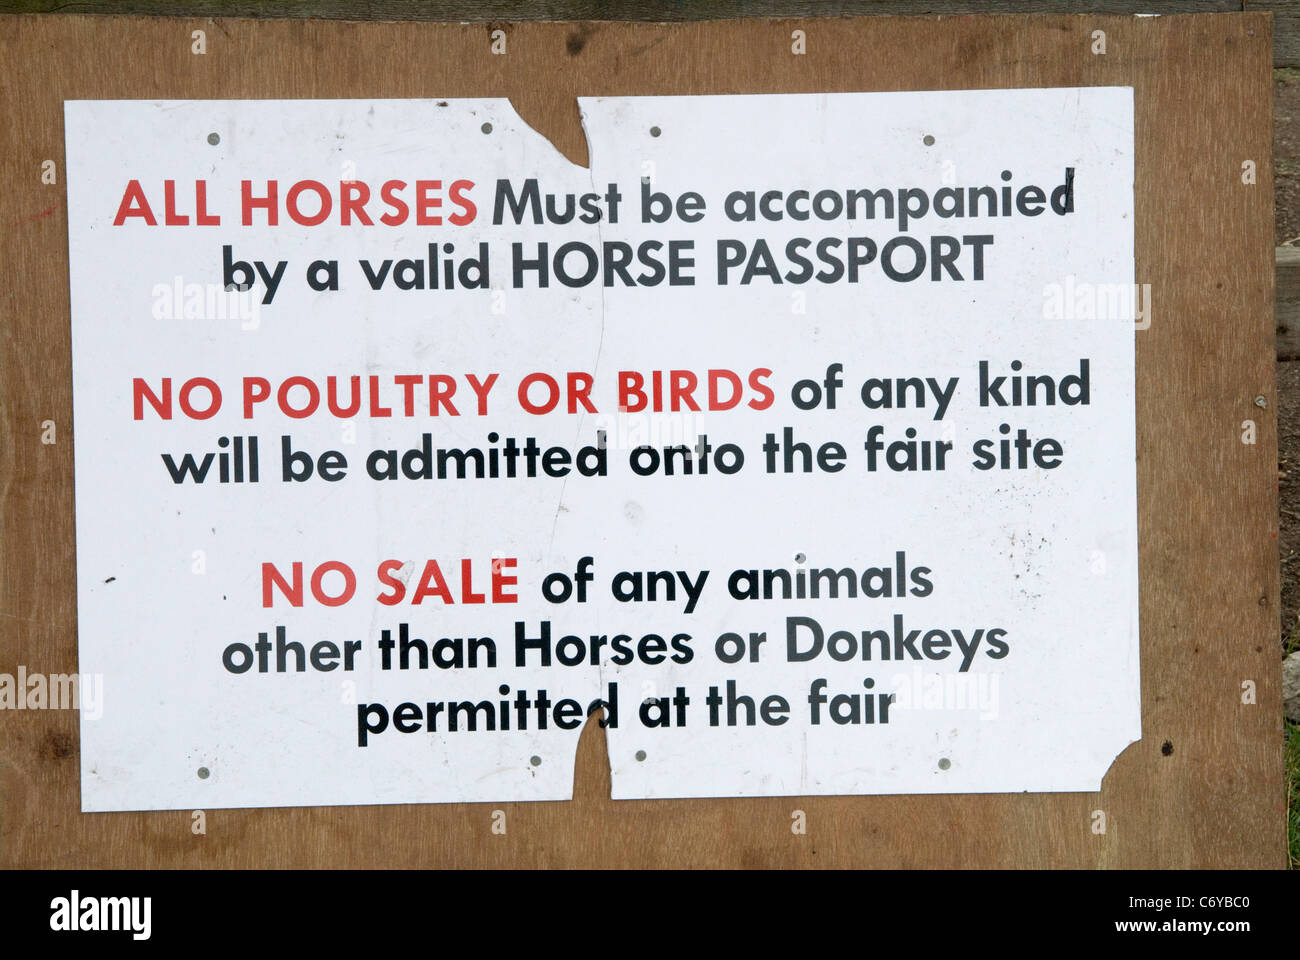 Appleby Horse Fair Girls Stock Photos &amp- Appleby Horse Fair Girls ...